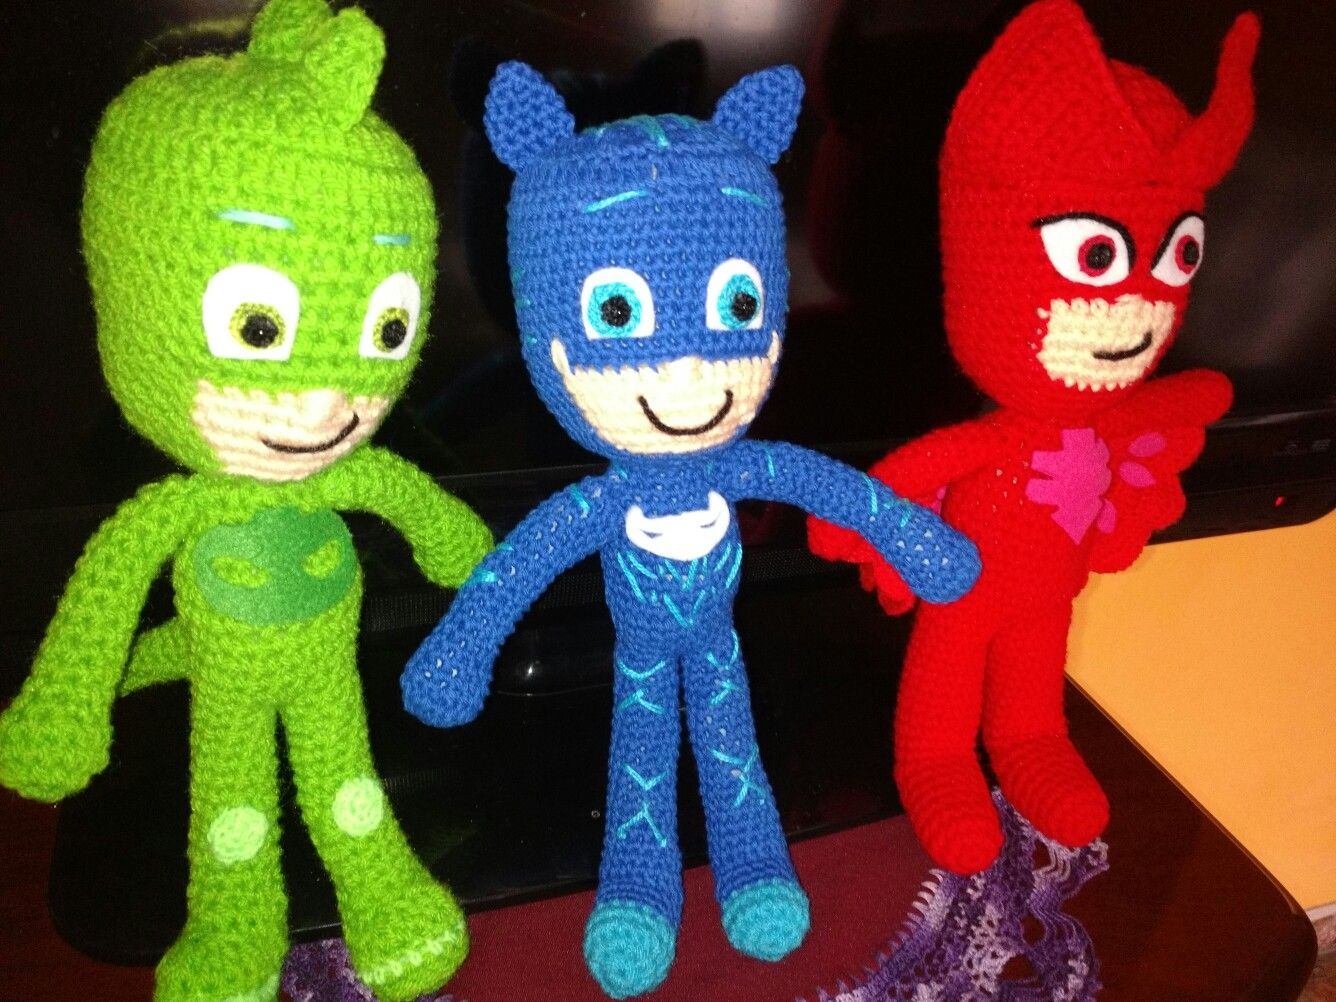 Amigurumi Oso Pijama : Héroes en piyama crochet héroes en pijamas crochet